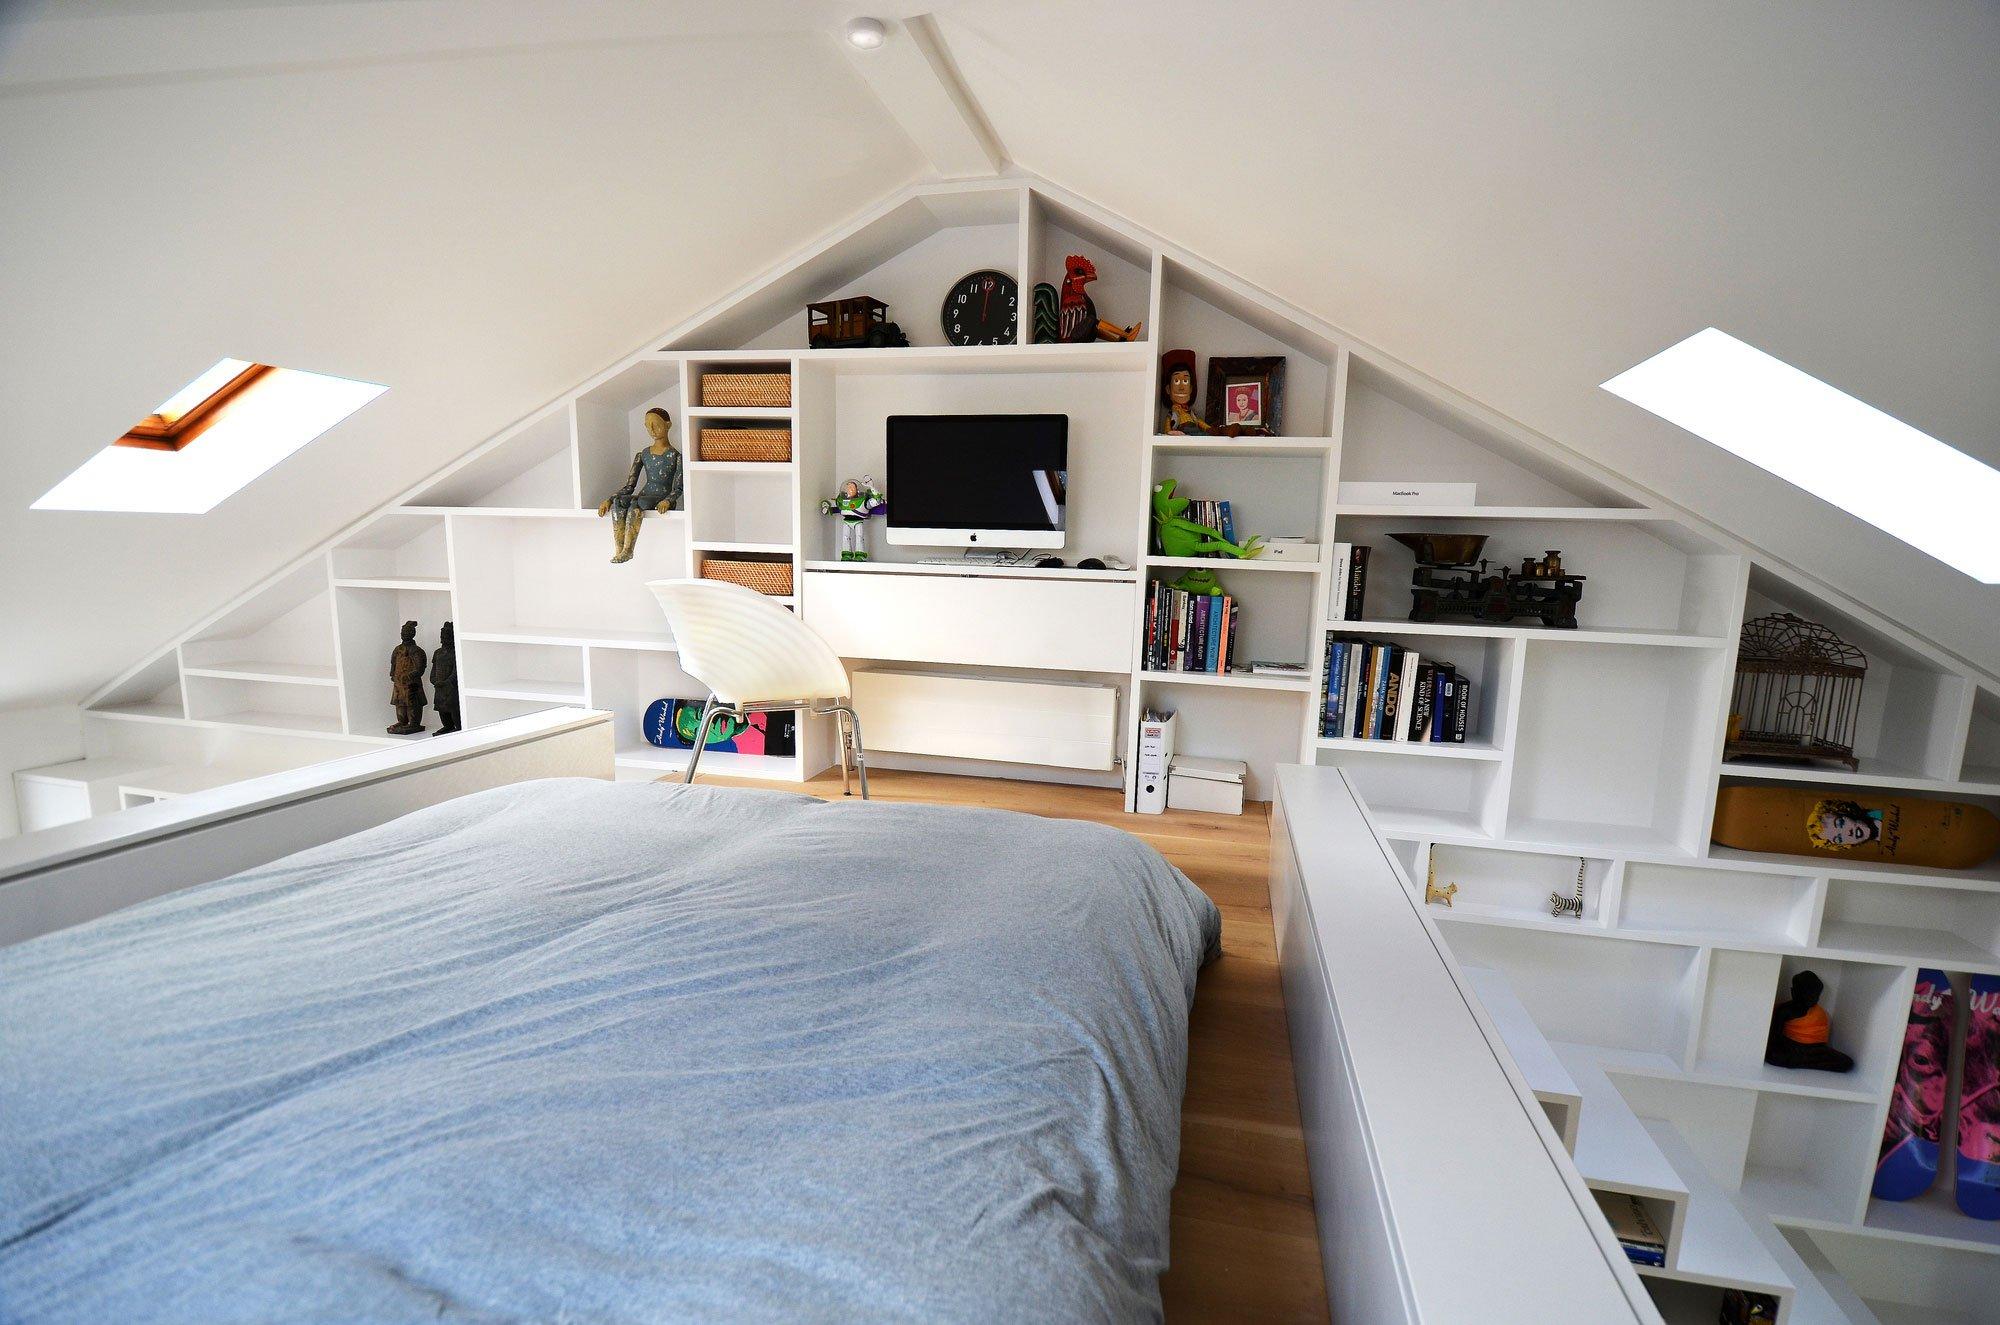 loft-space-in-camden-13